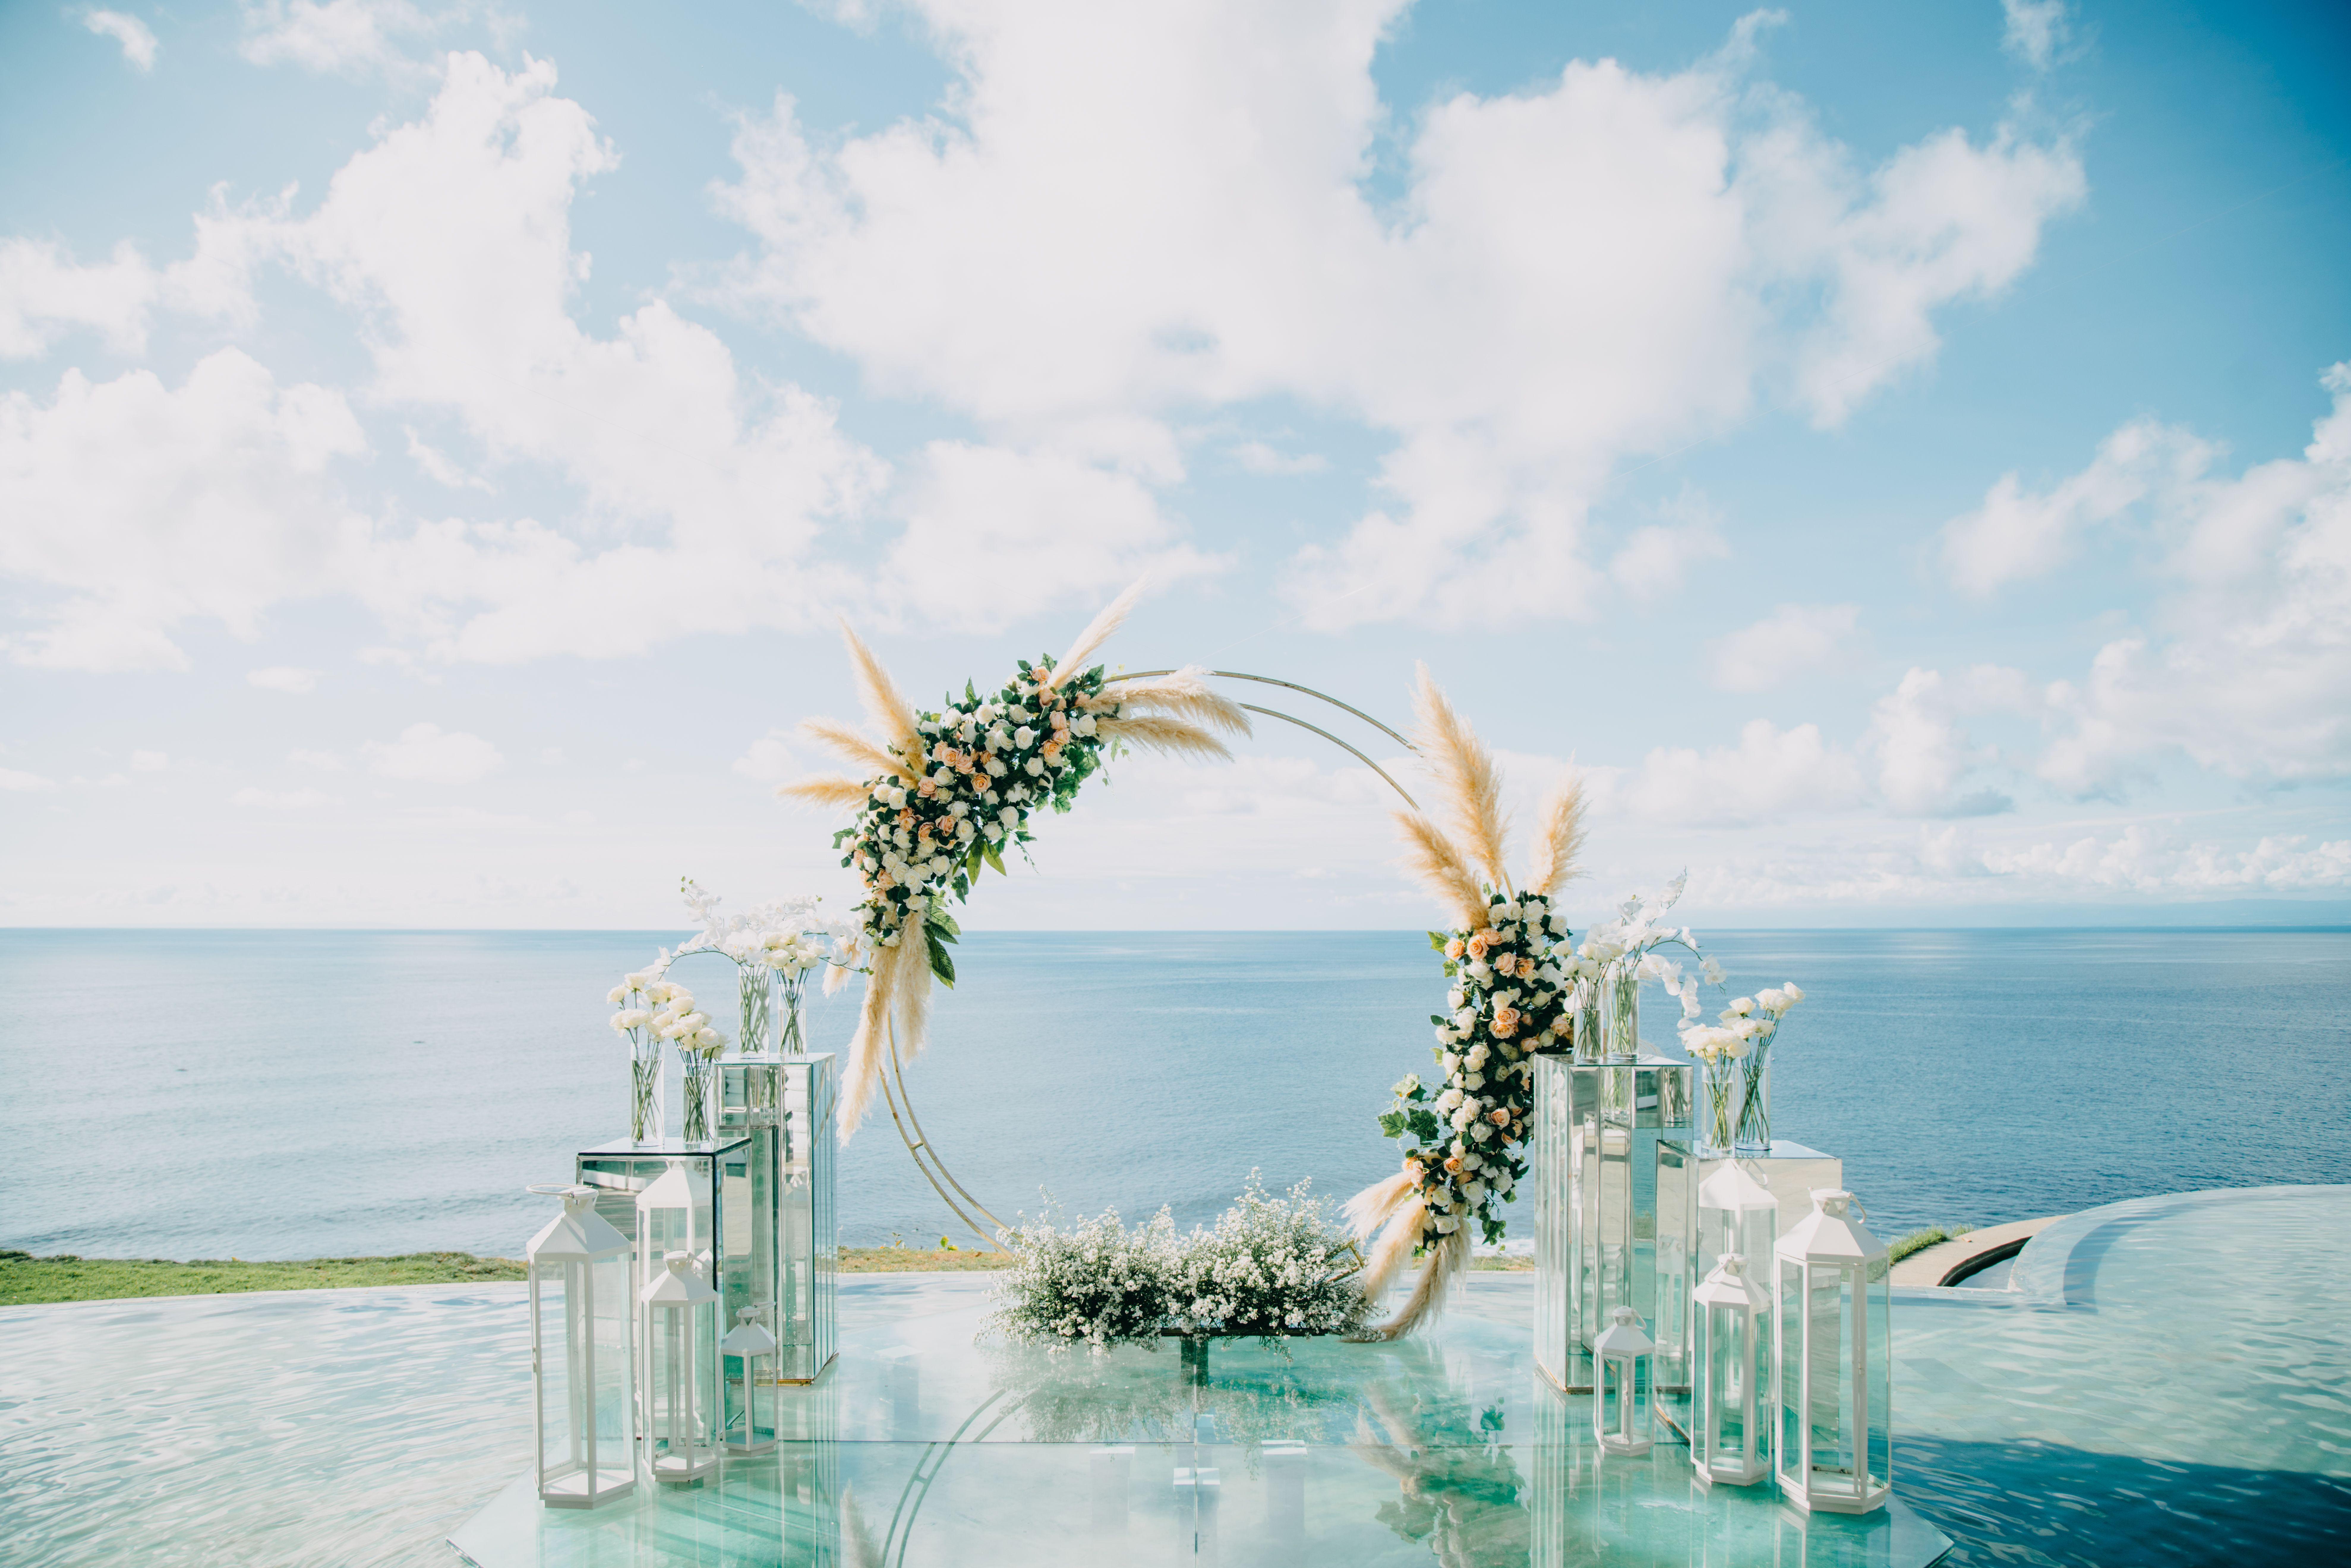 Pin on Water Wedding